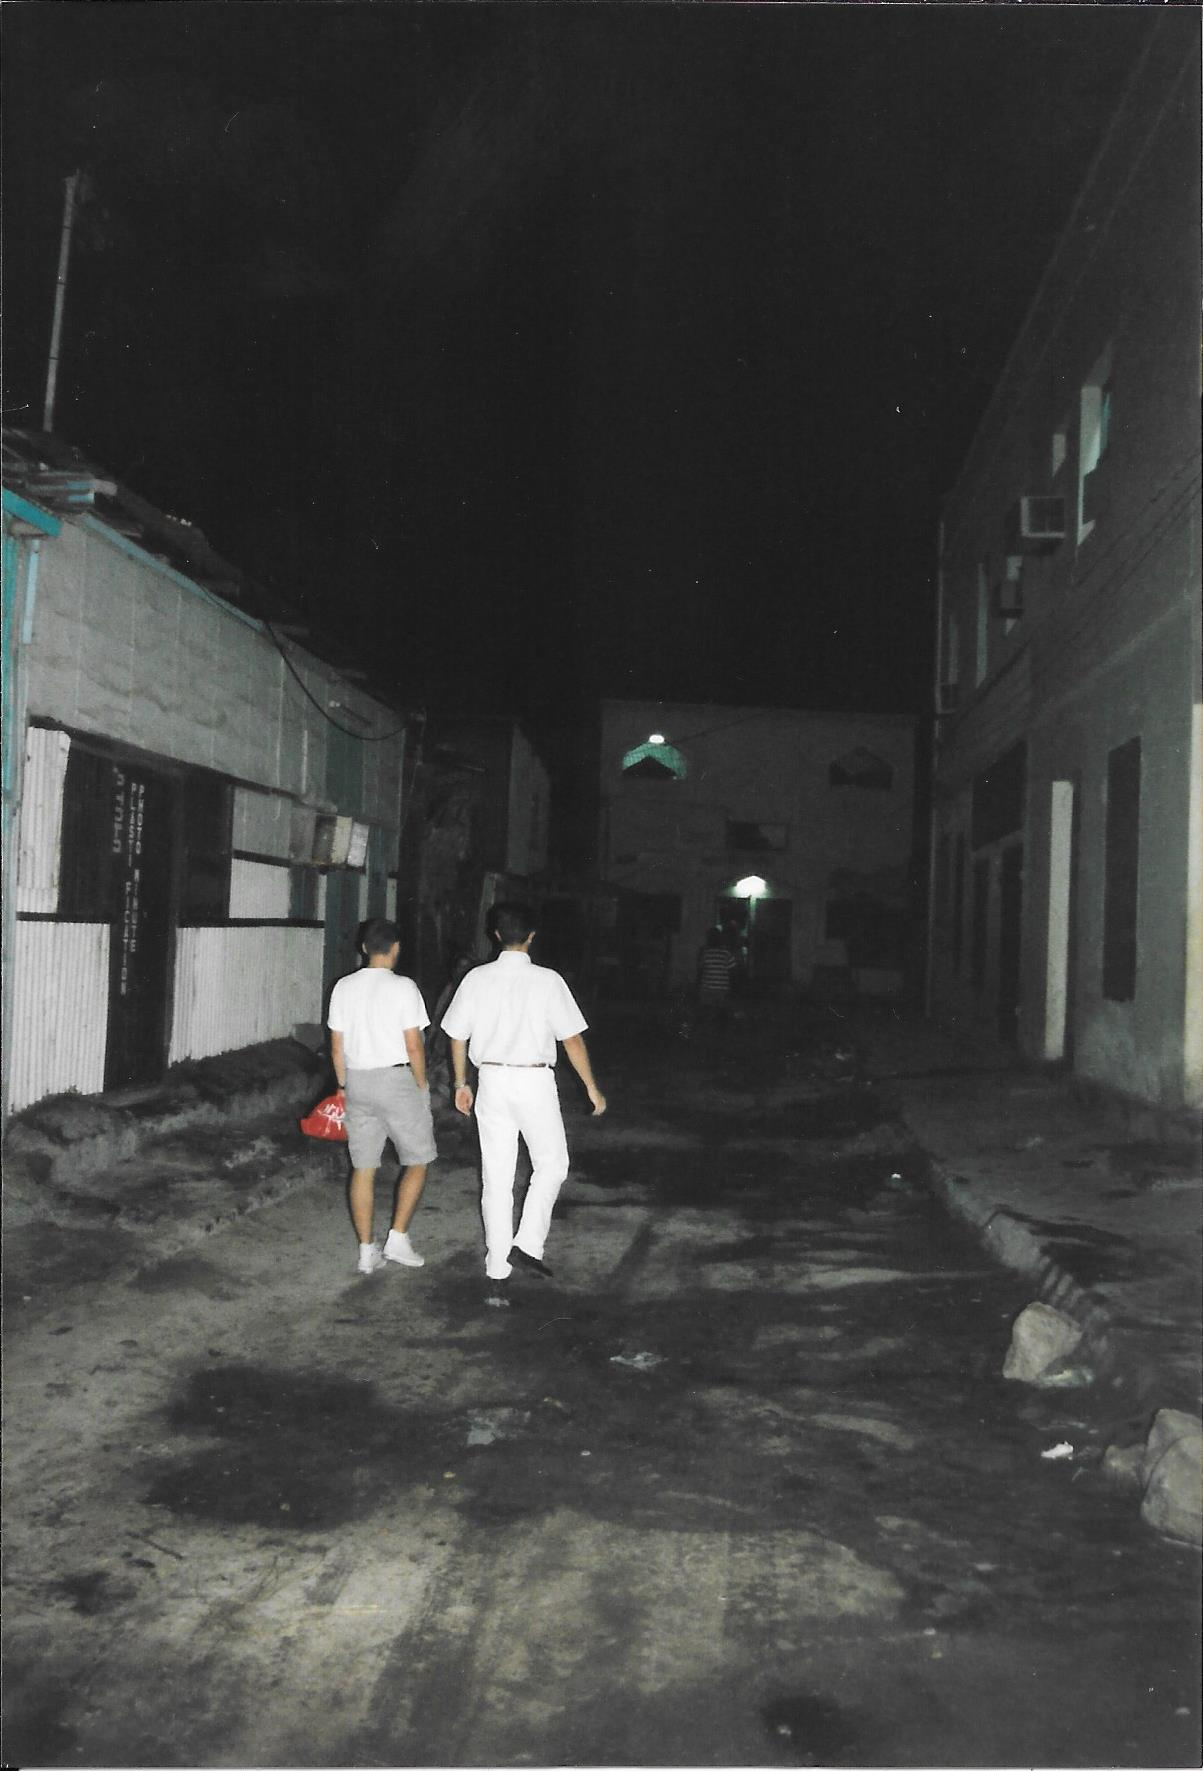 [Campagne] DJIBOUTI - TOME 1 - Page 21 113